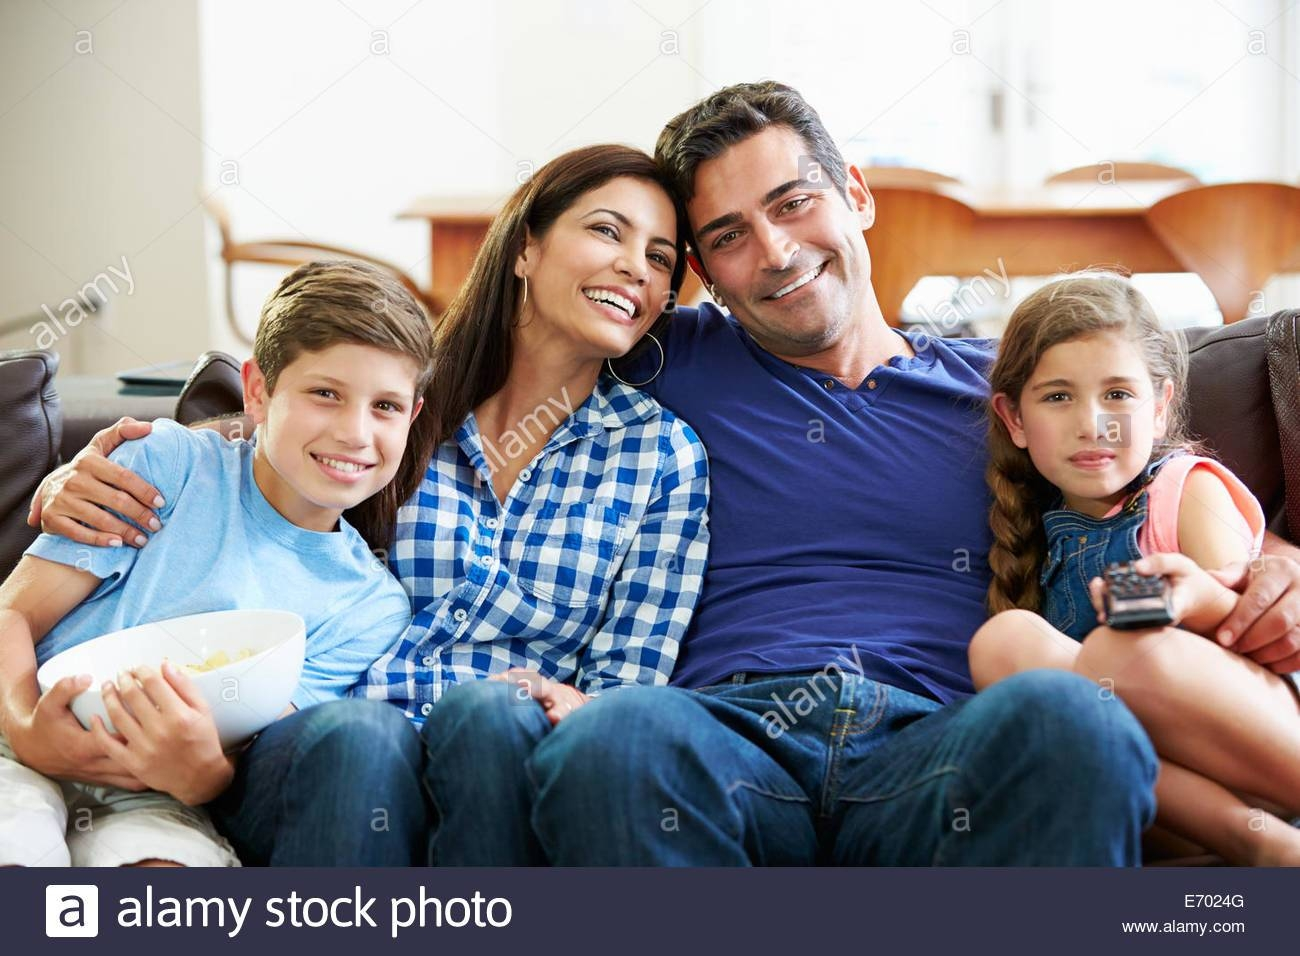 Family Sitting On Sofa Stock Photos & Family Sitting On Sofa Stock with regard to Family Sofa (Image 10 of 30)